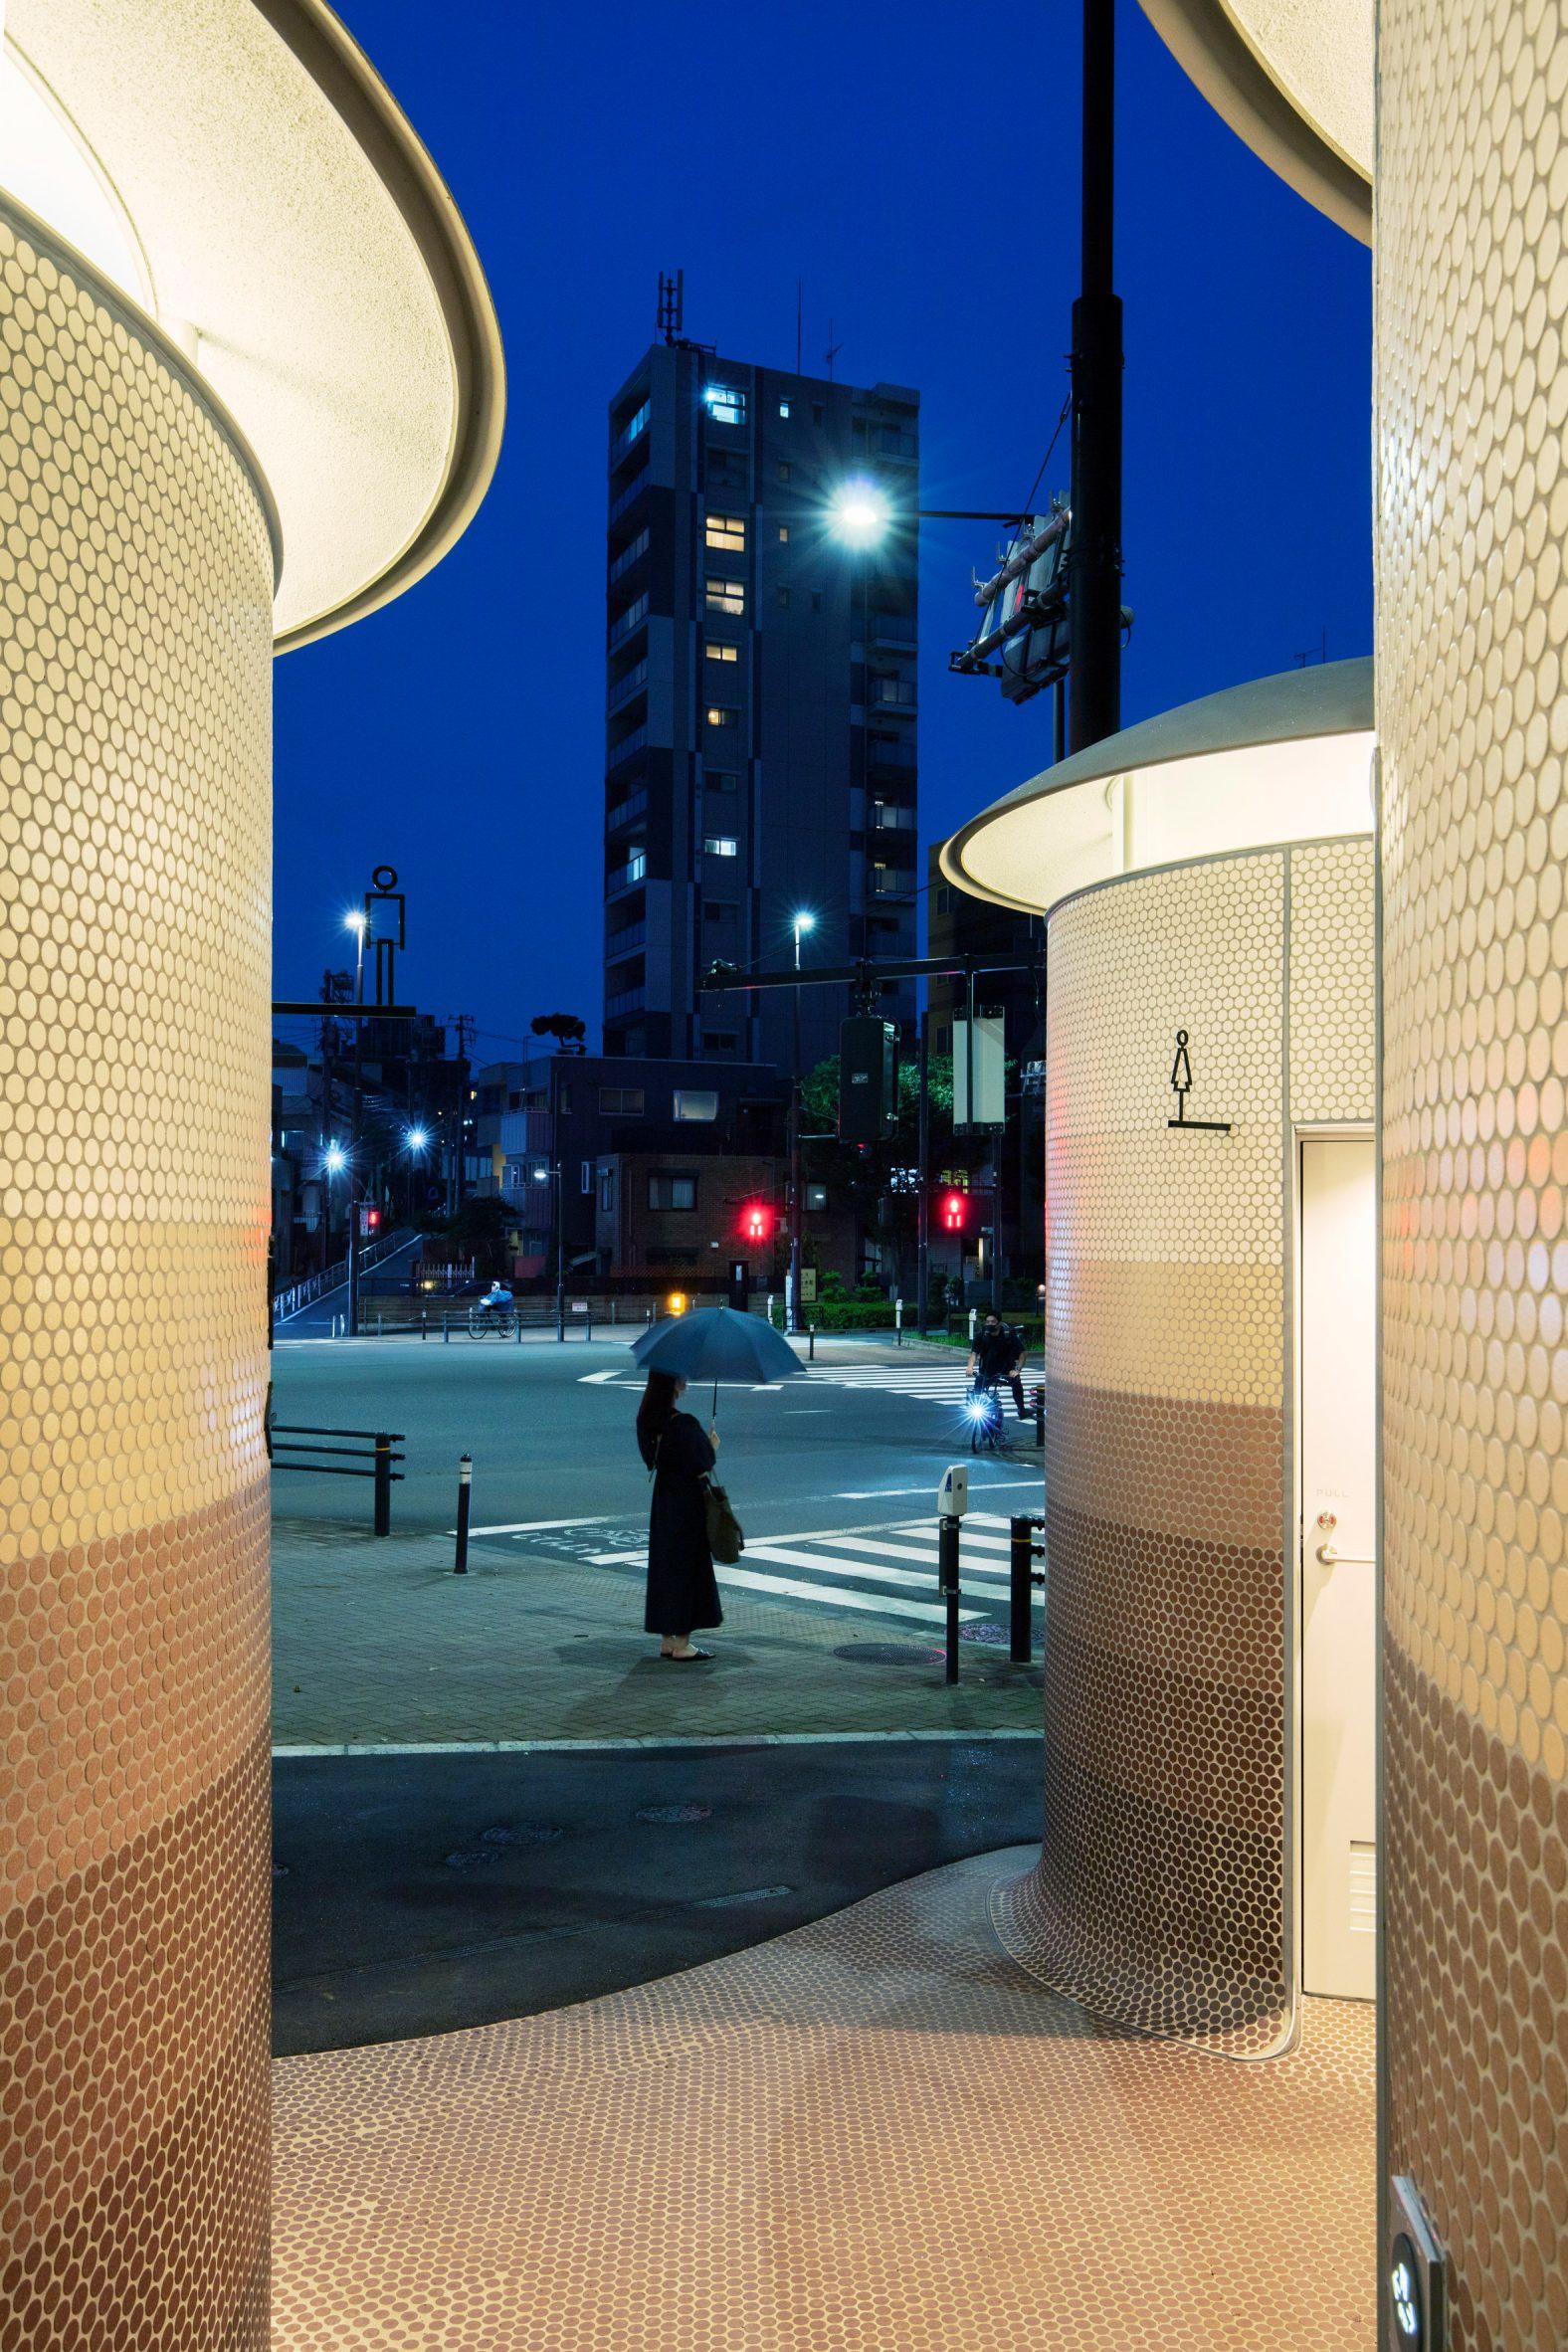 Public toilet at night